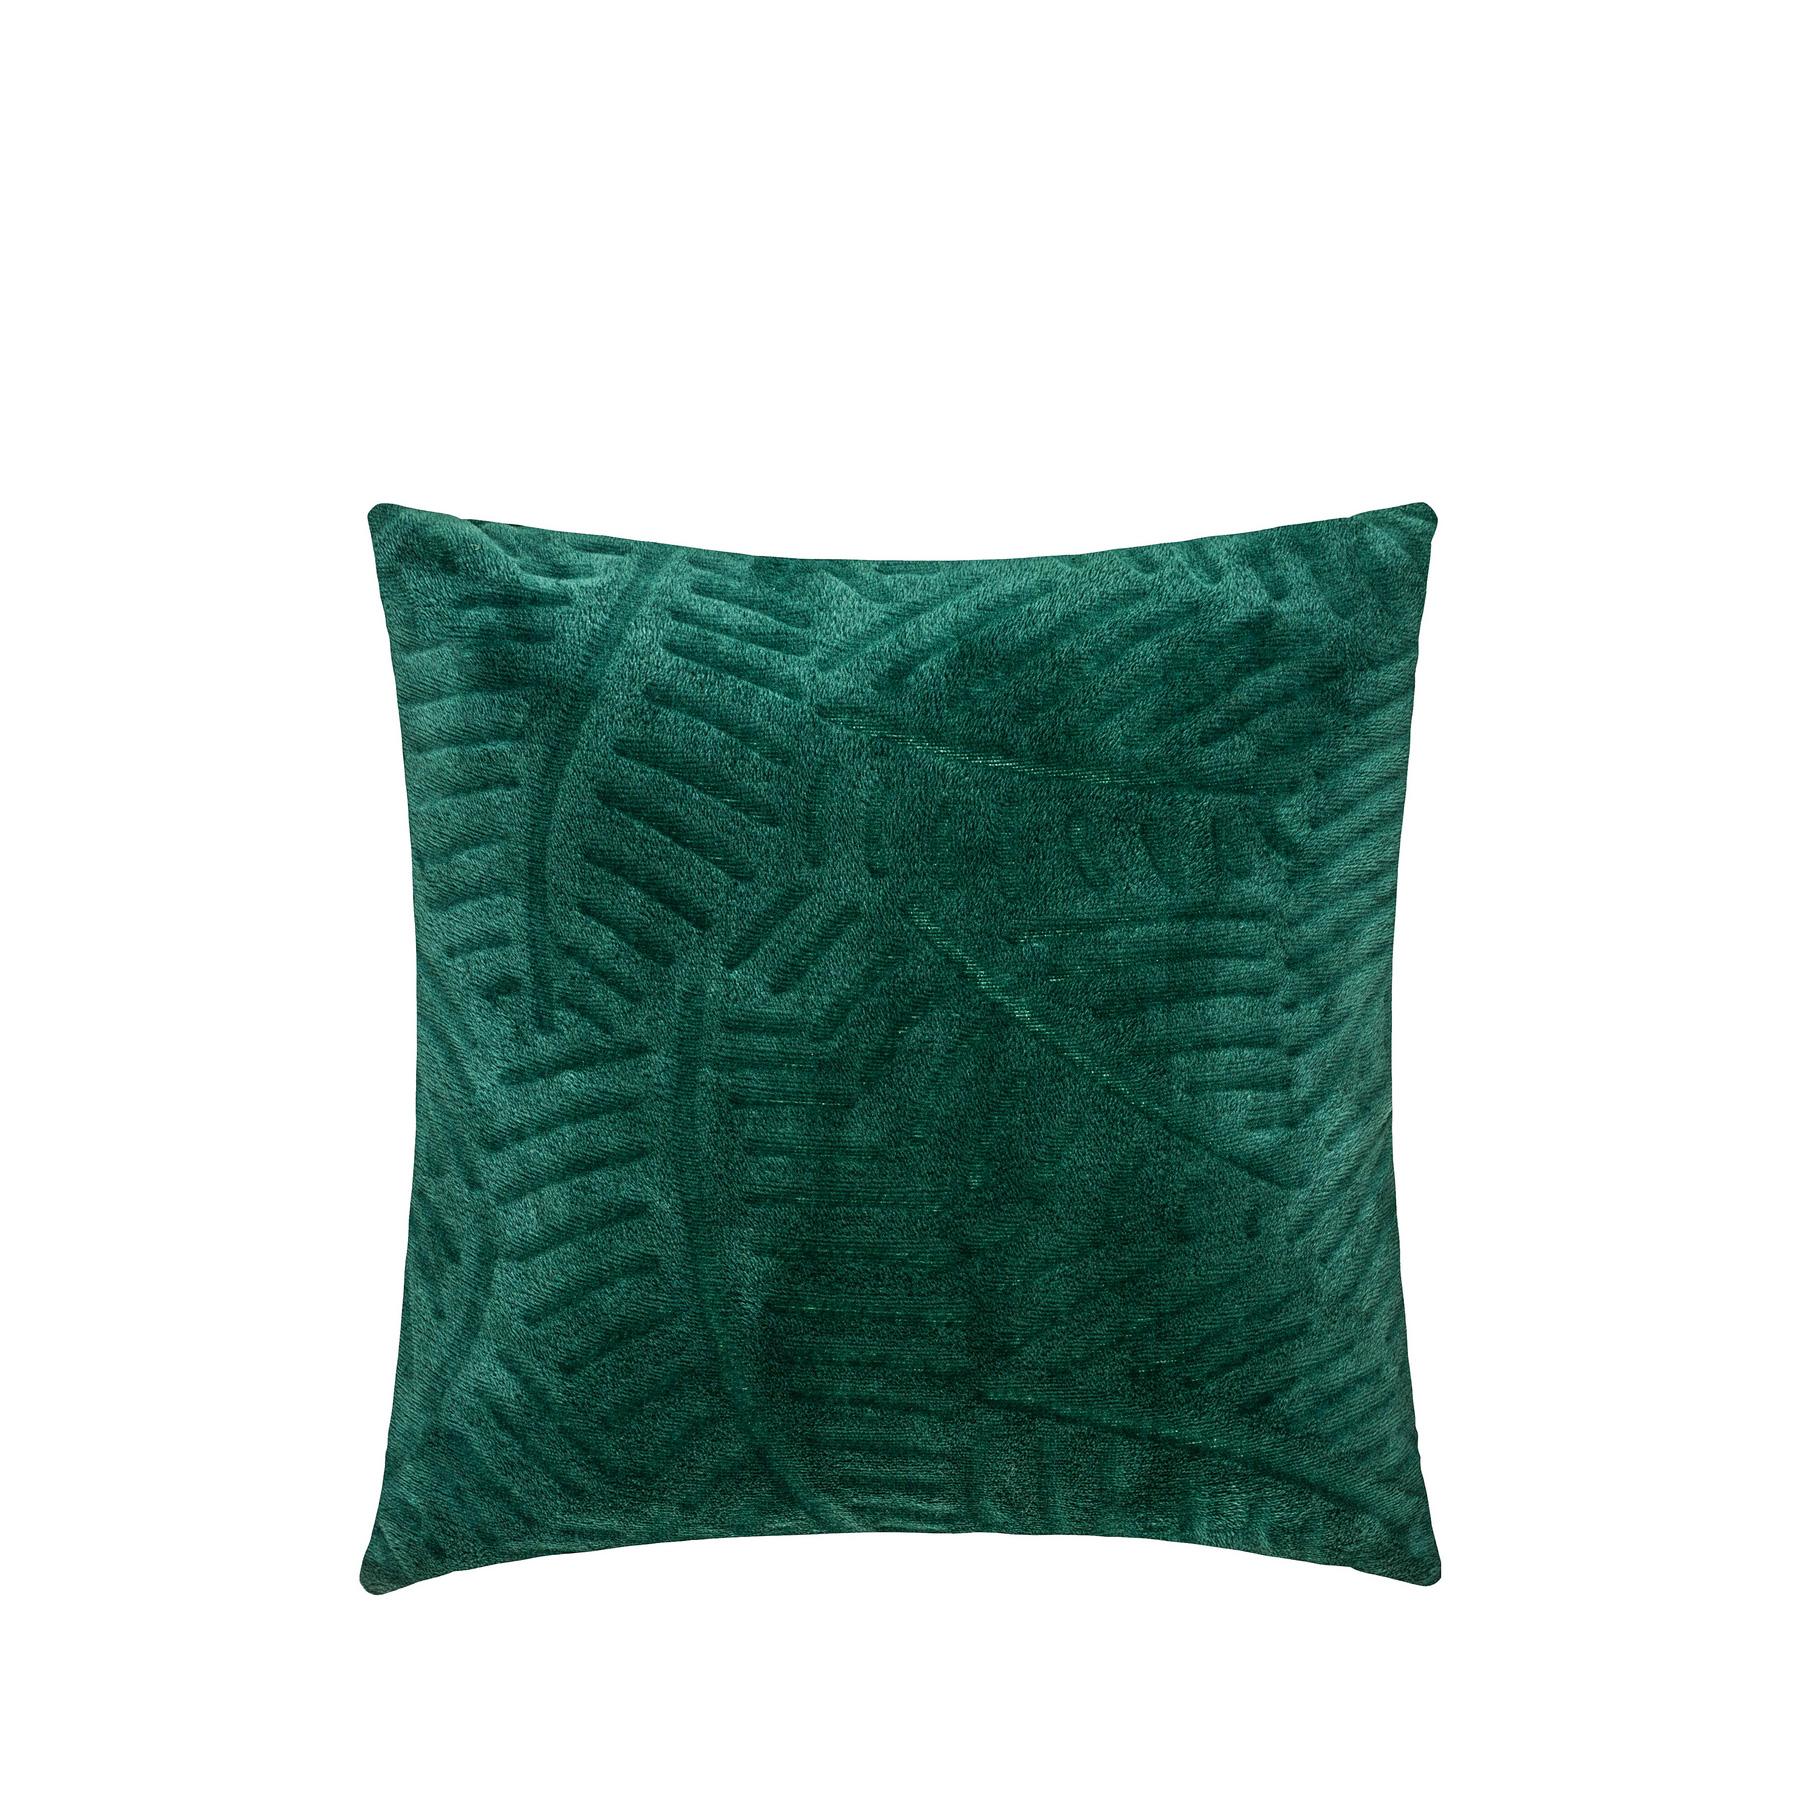 JJA VankúŠik Lux - Zelená